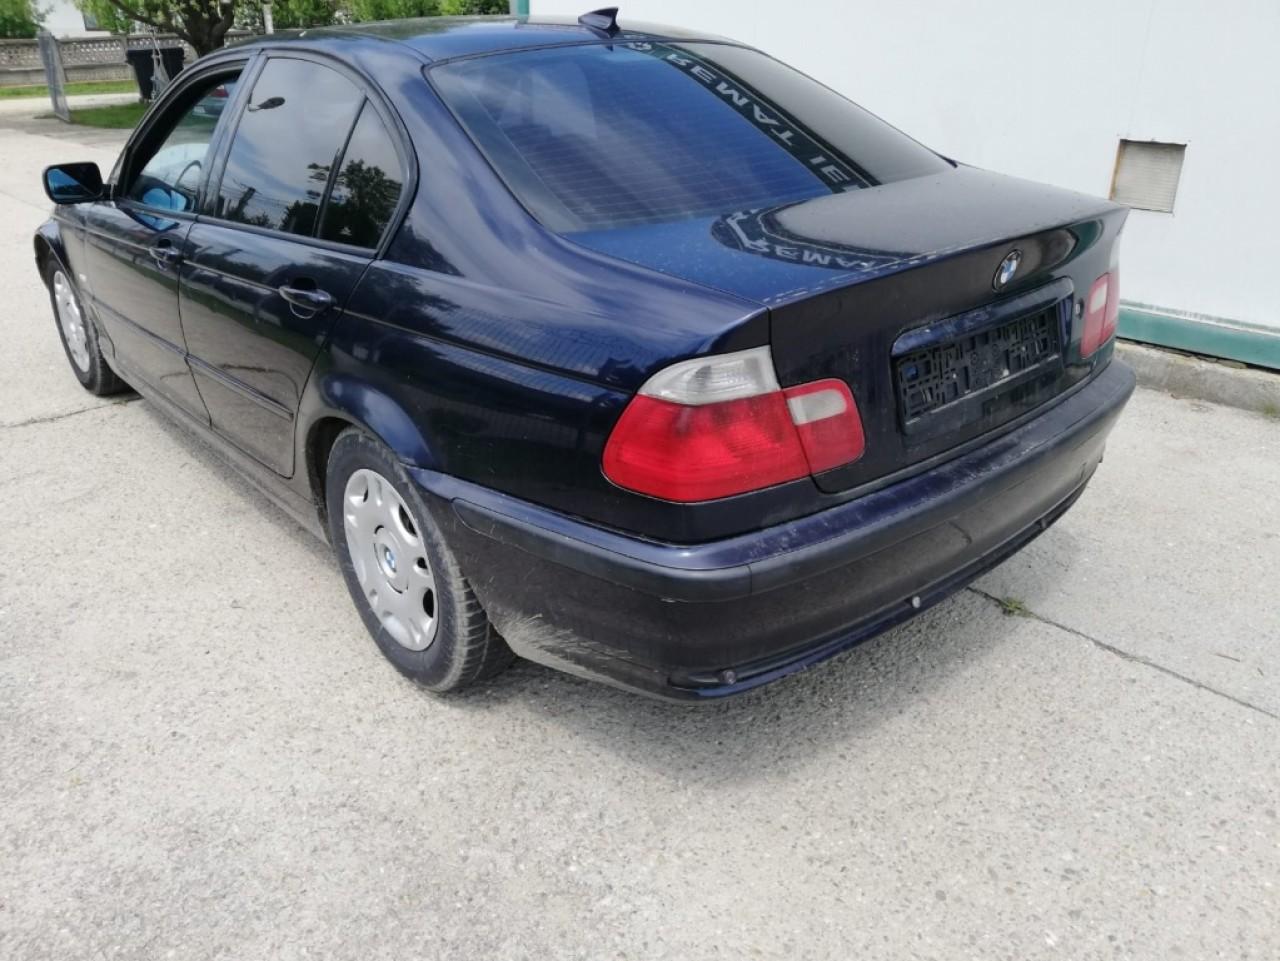 POMPA BENZINA COMPLETA COD 228.222/009/002 BMW SERIA 3 E46 316i FAB. 1998 – 2005 ⭐⭐⭐⭐⭐